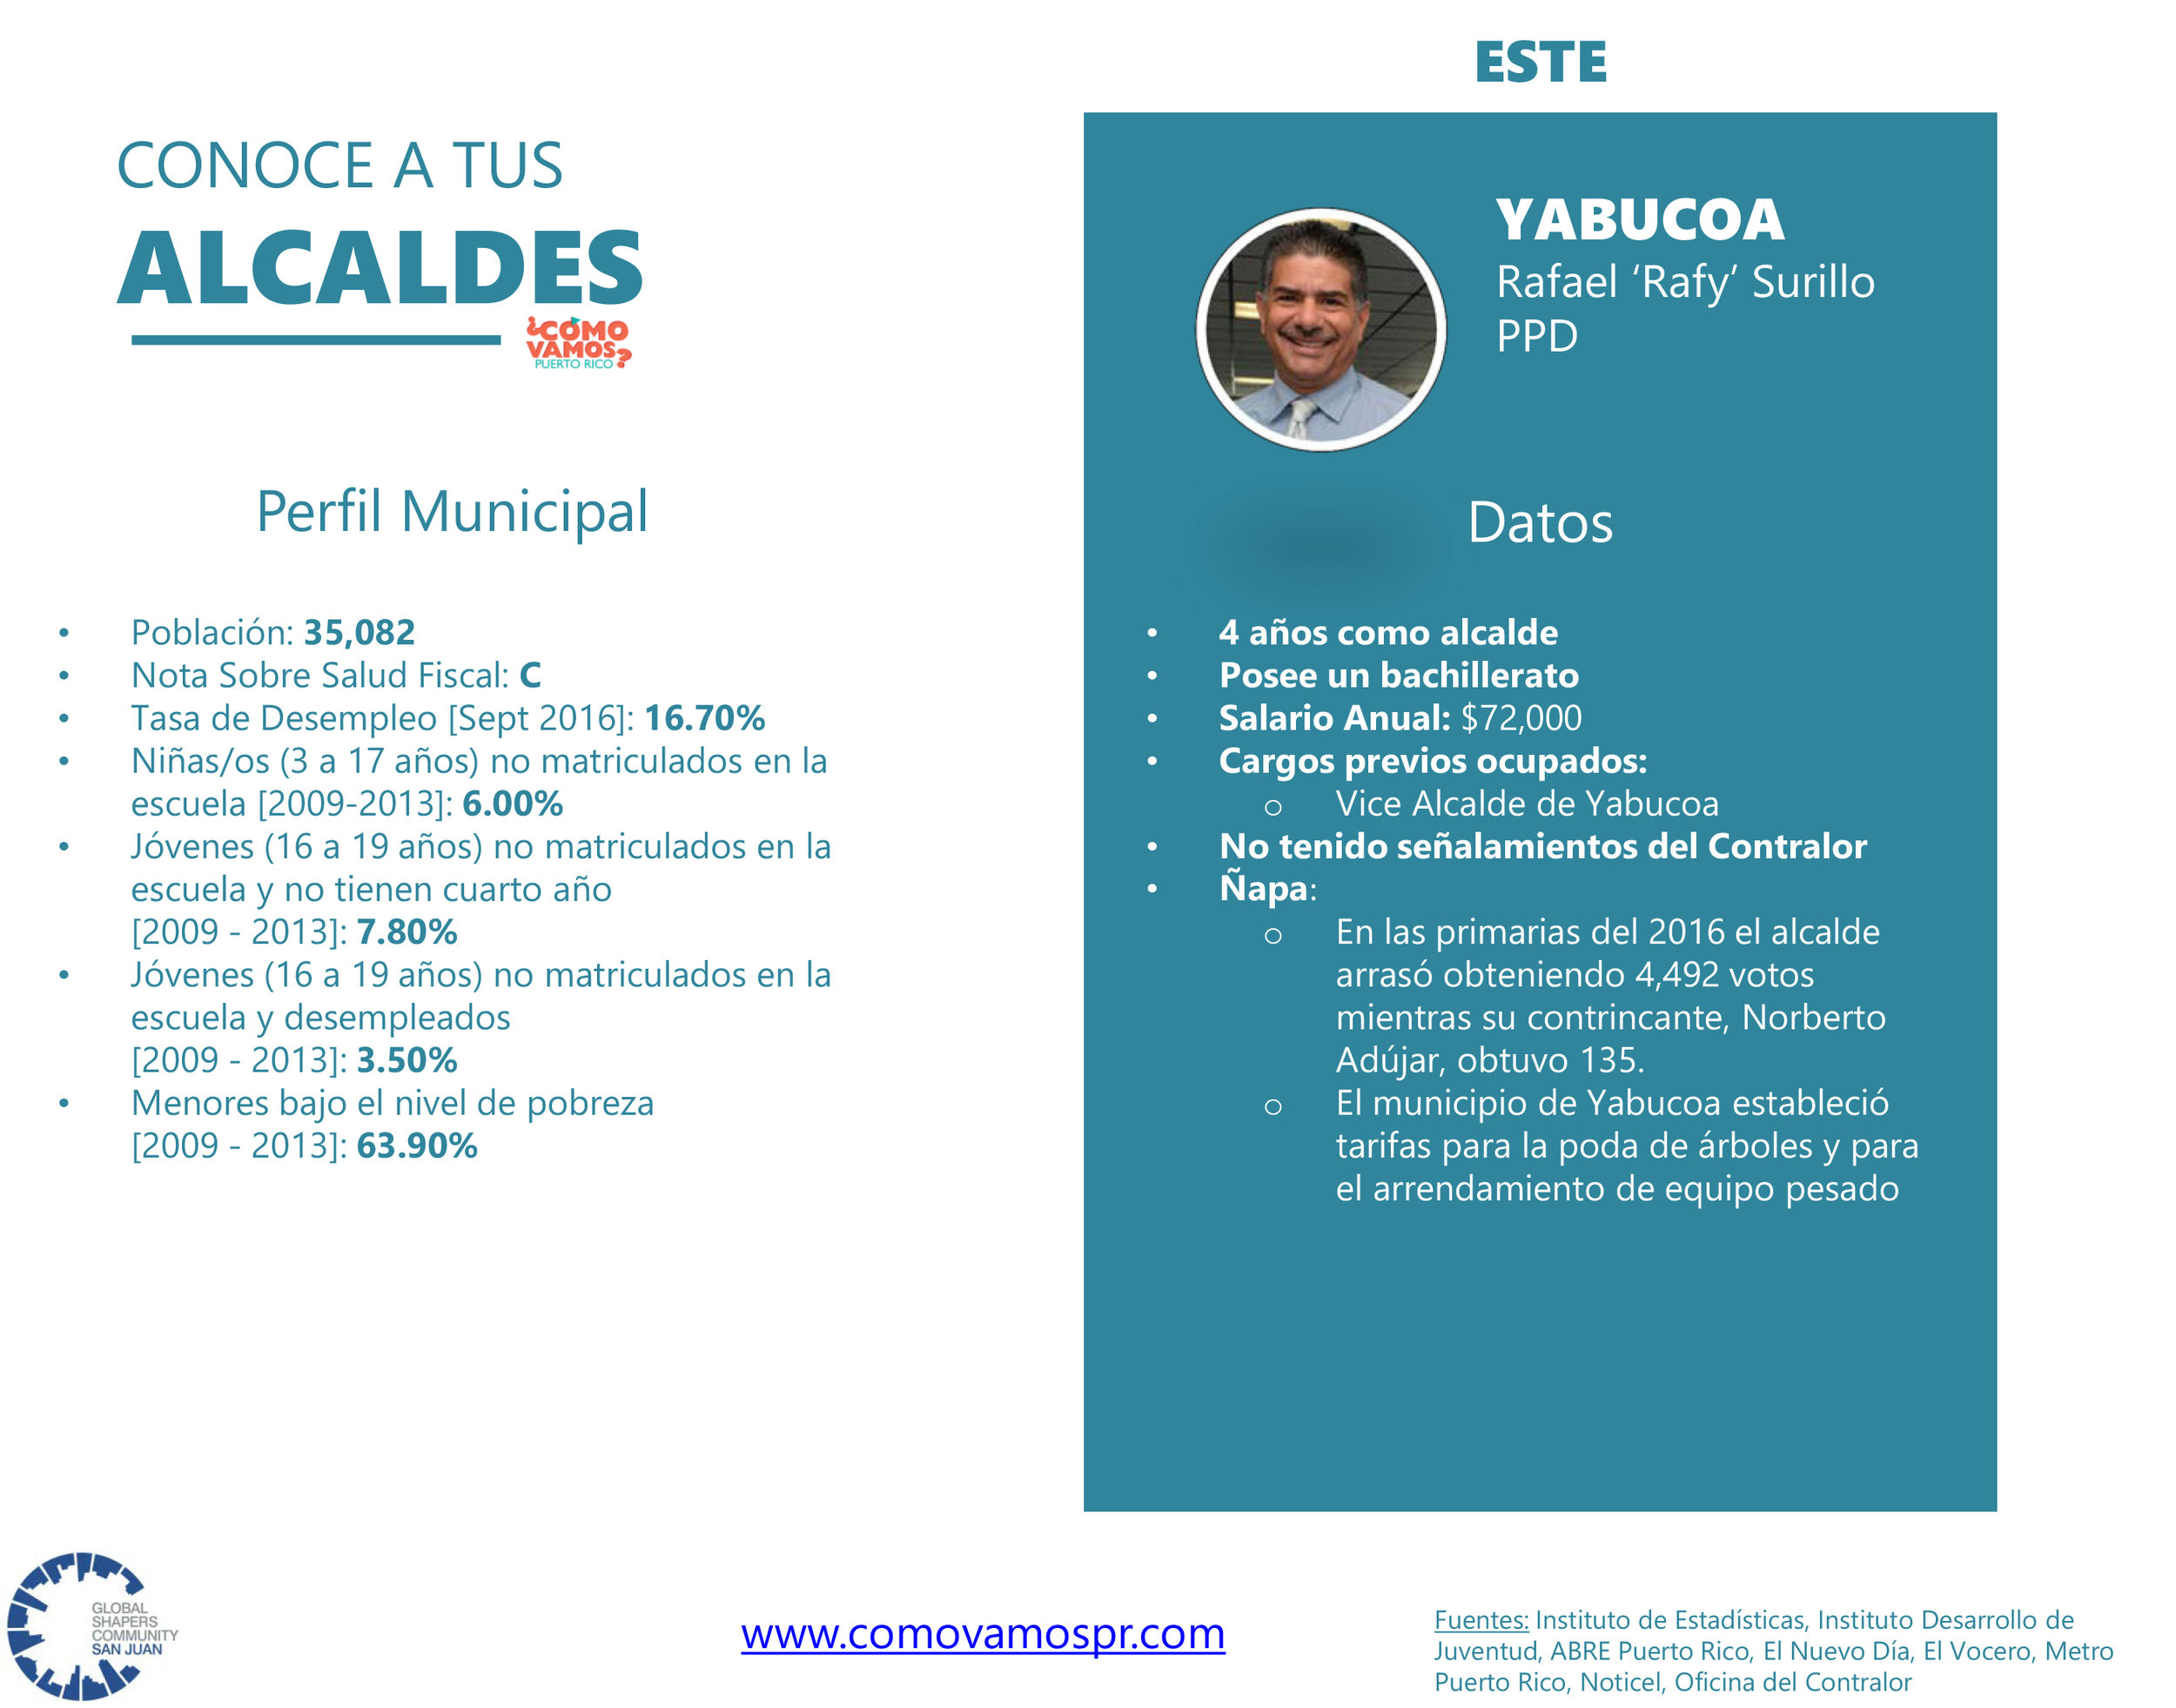 Alcaldes_Este_Yabucoa.jpg